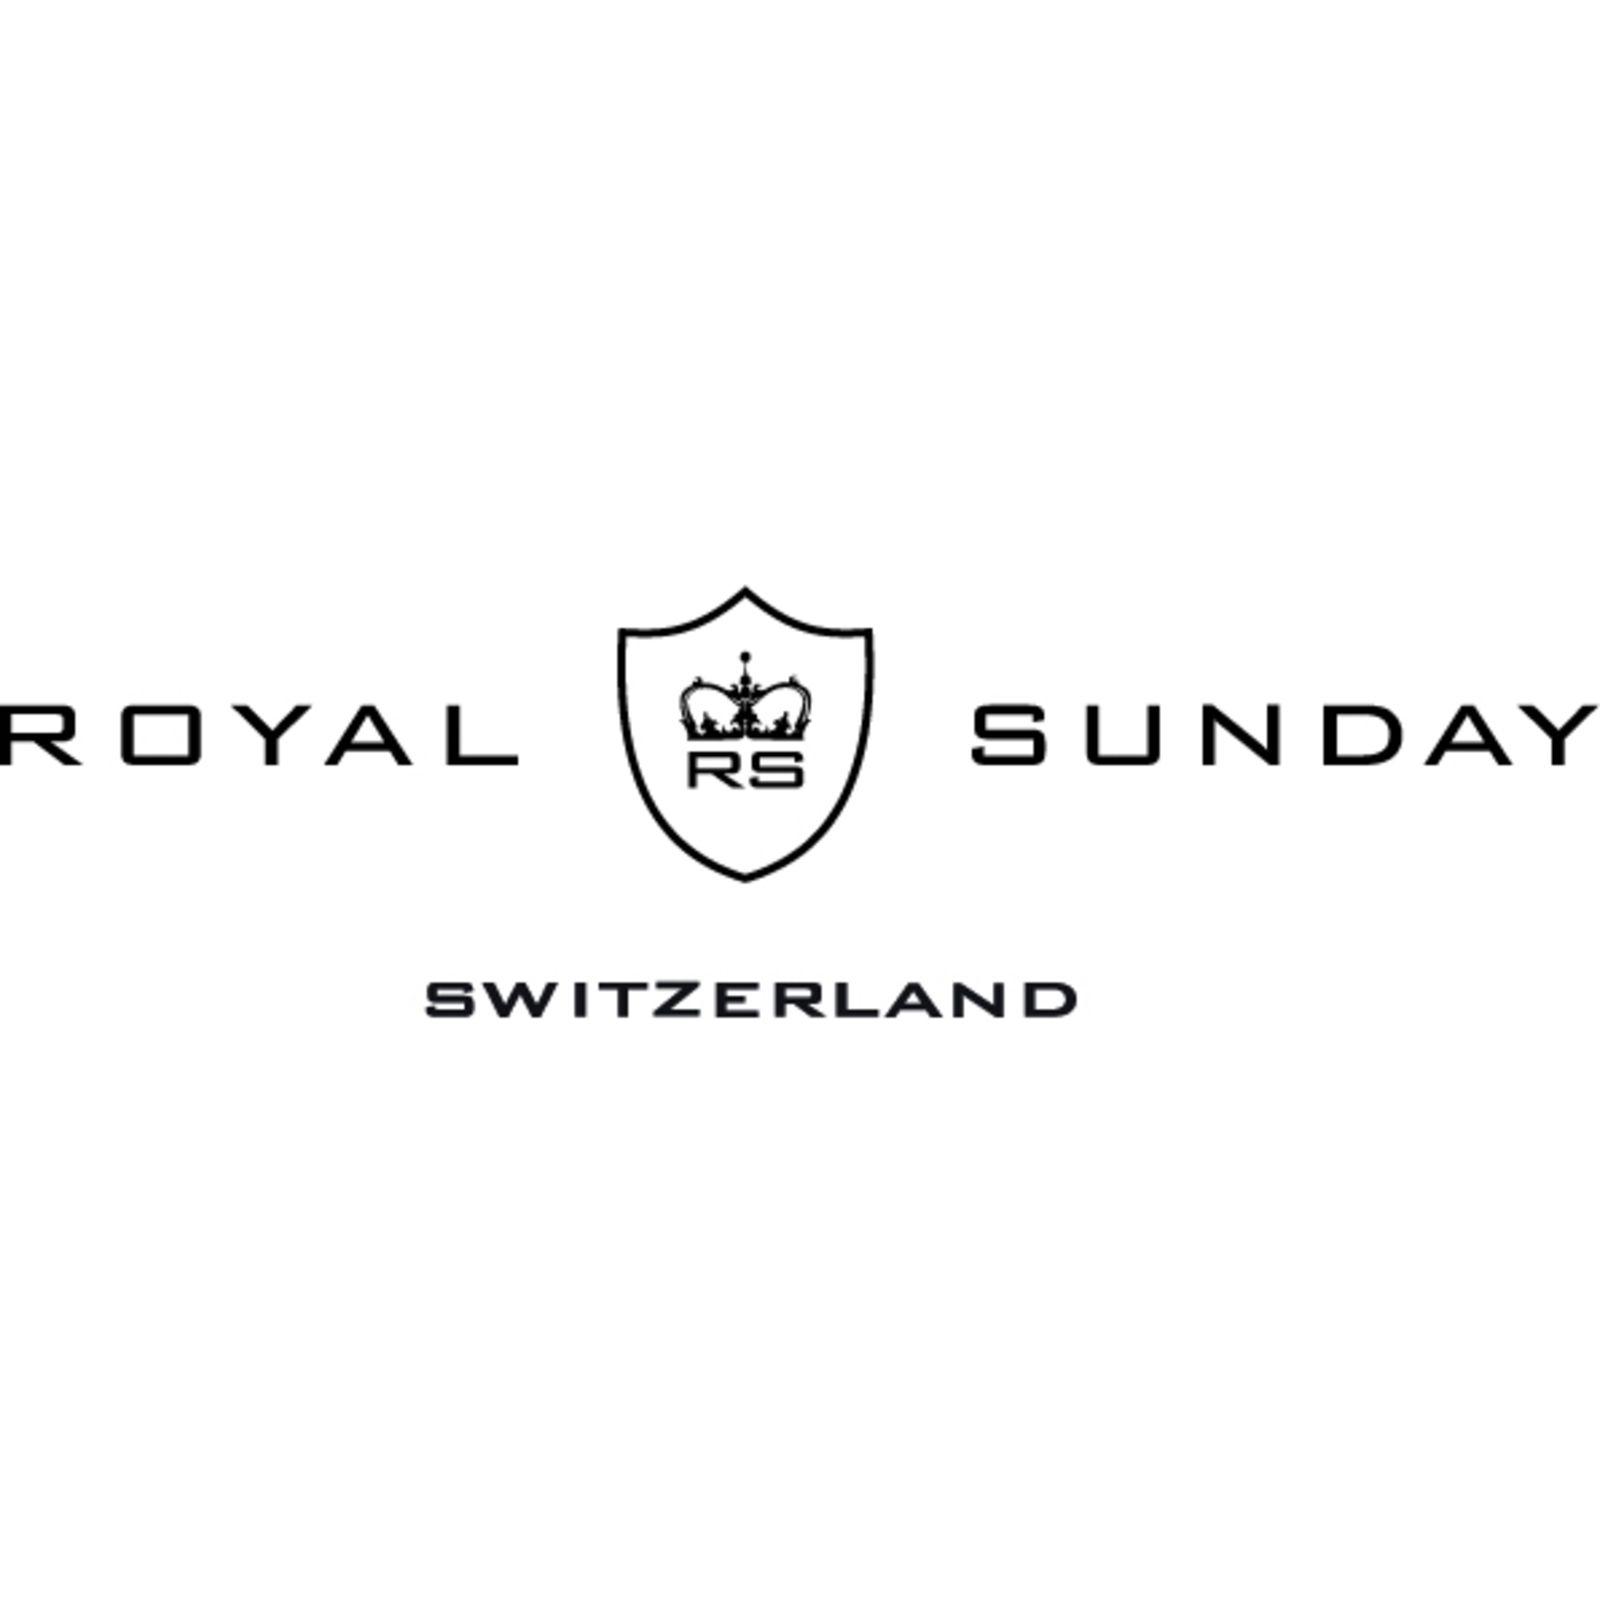 ROYAL SUNDAY